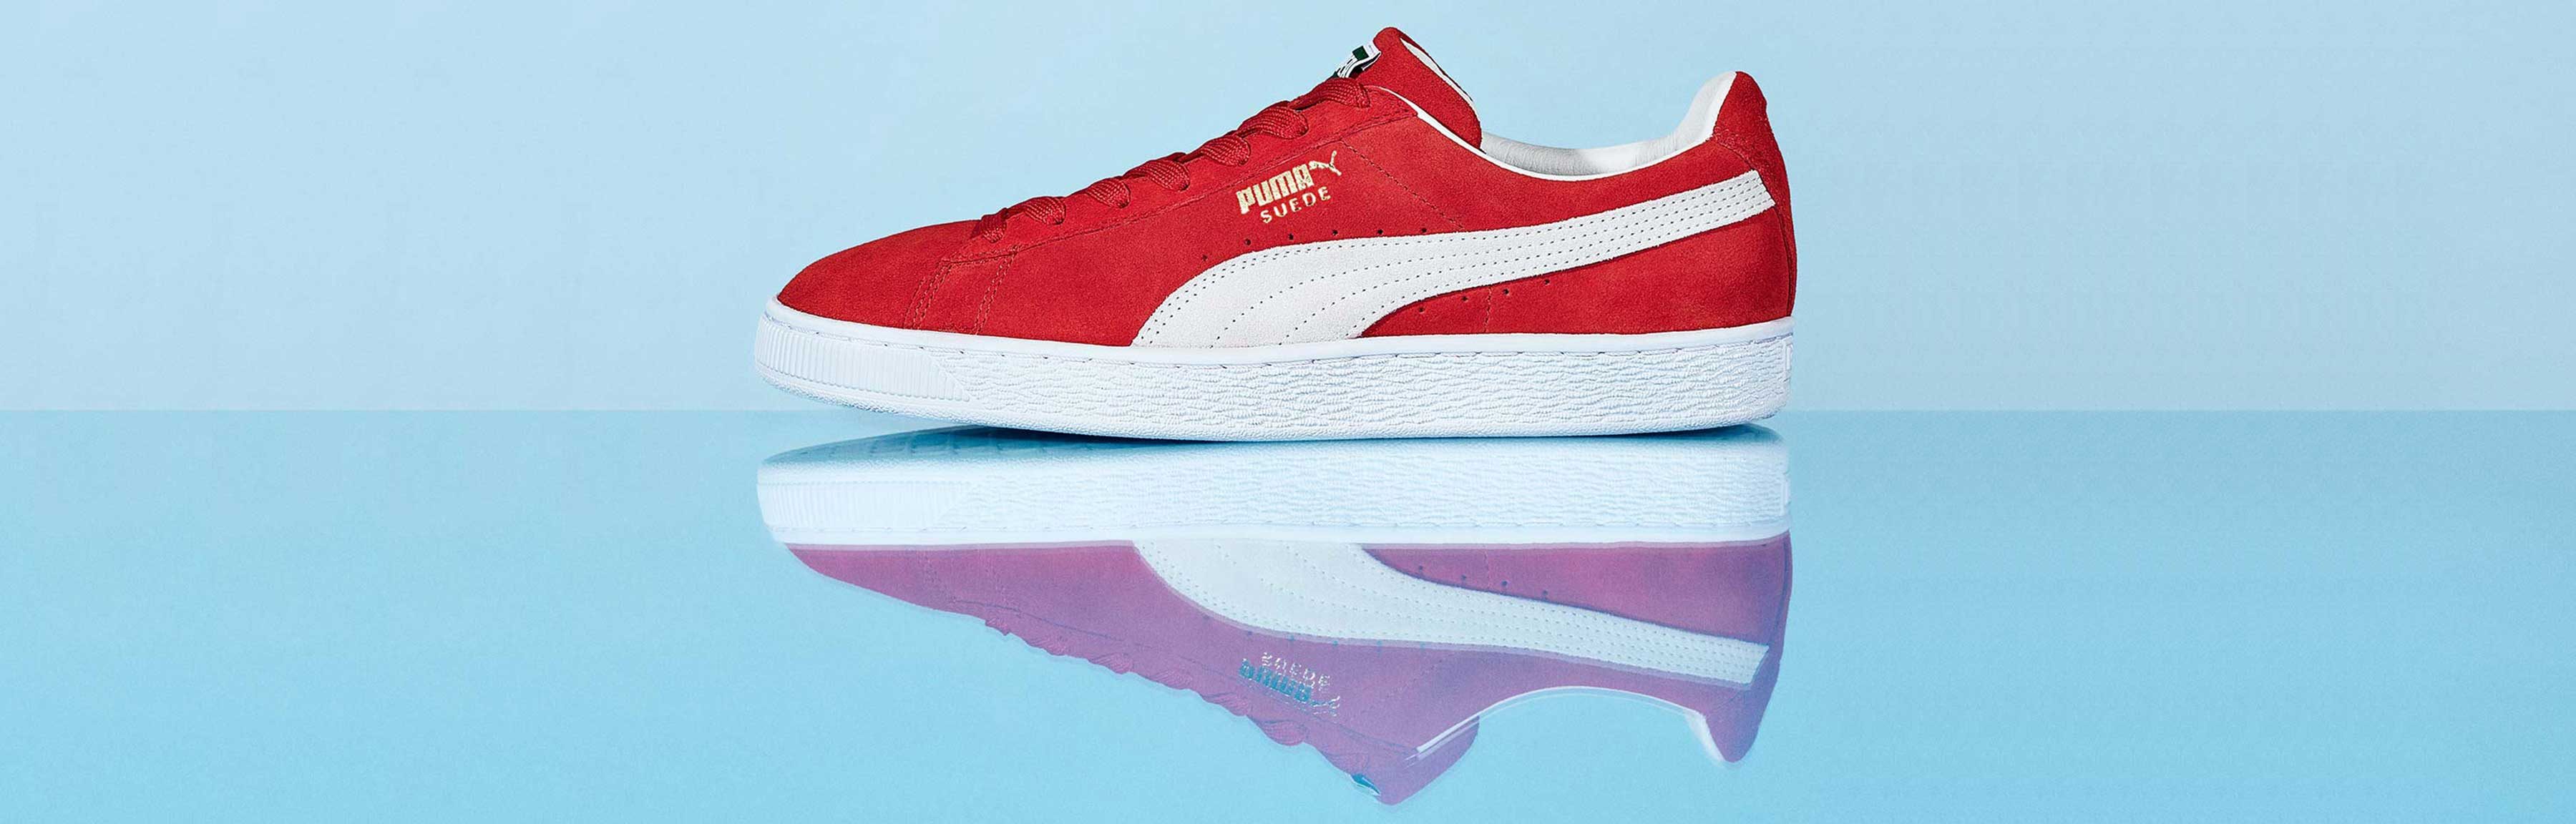 670058f701a Grijze Puma Suede Classic online kopen | Puma sneakers | Zalando